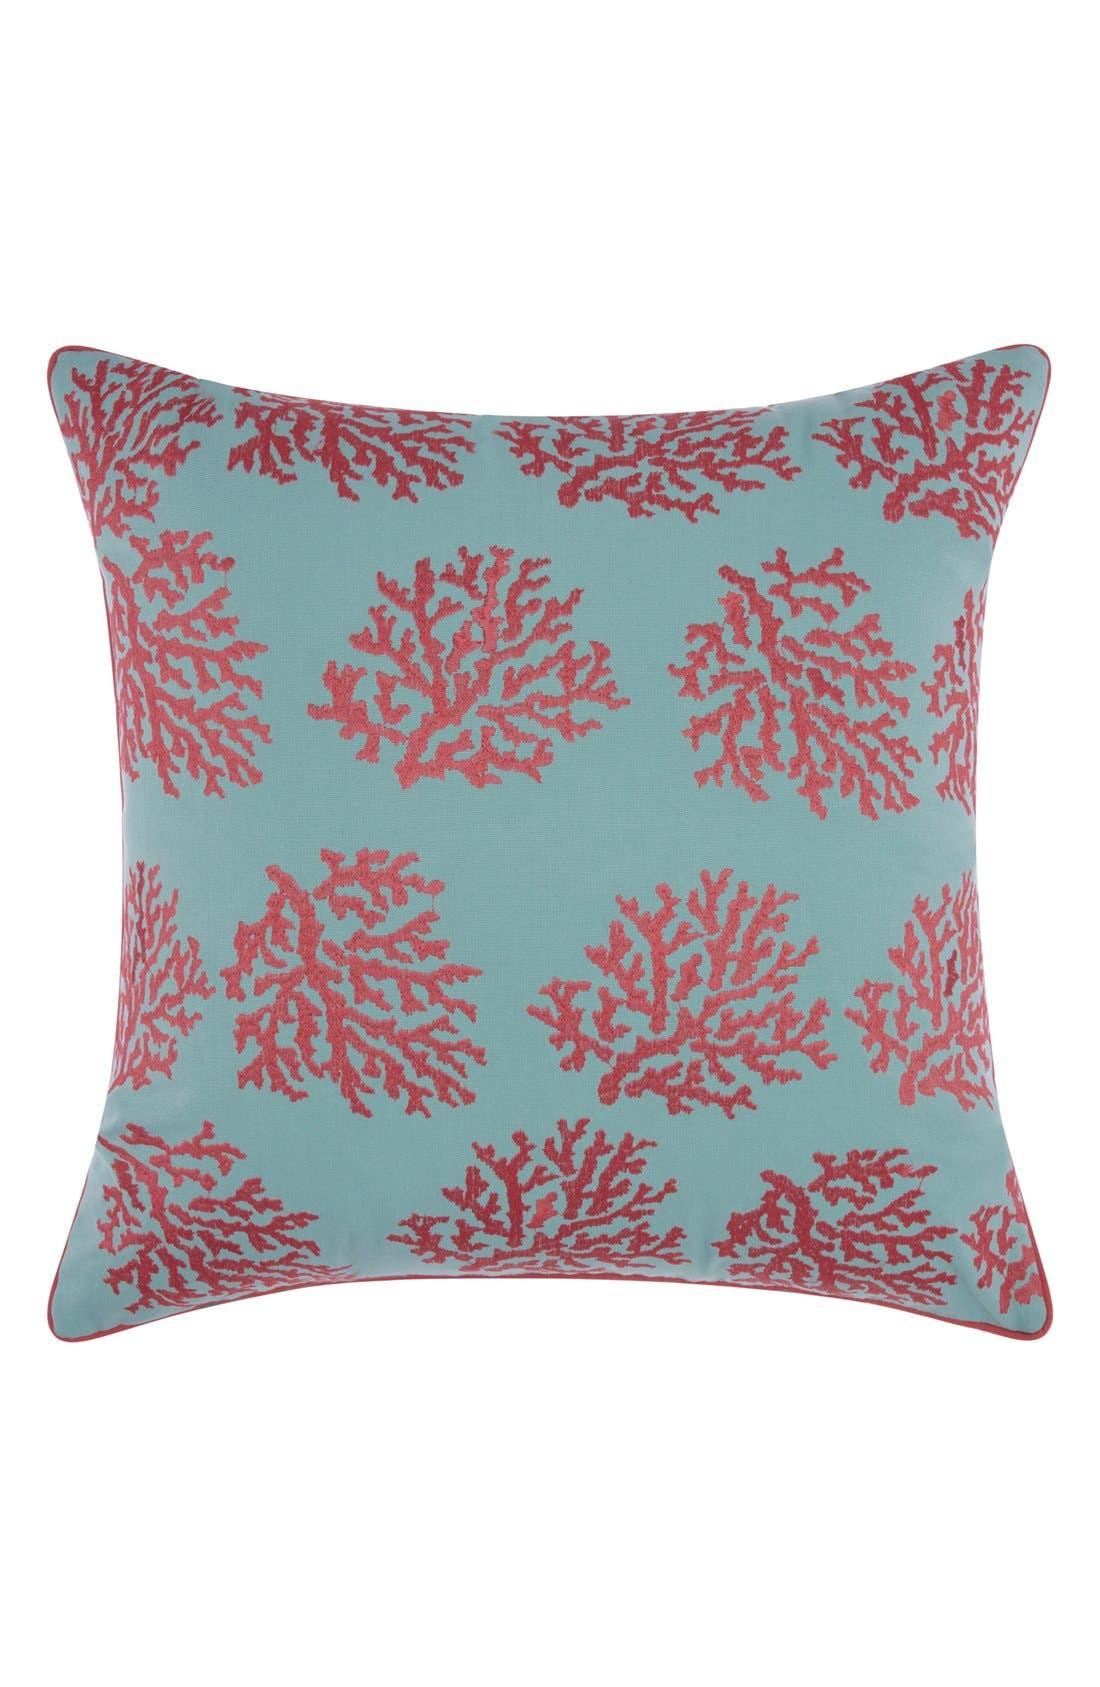 Mina Victory Indoor/Outdoor Accent Pillow